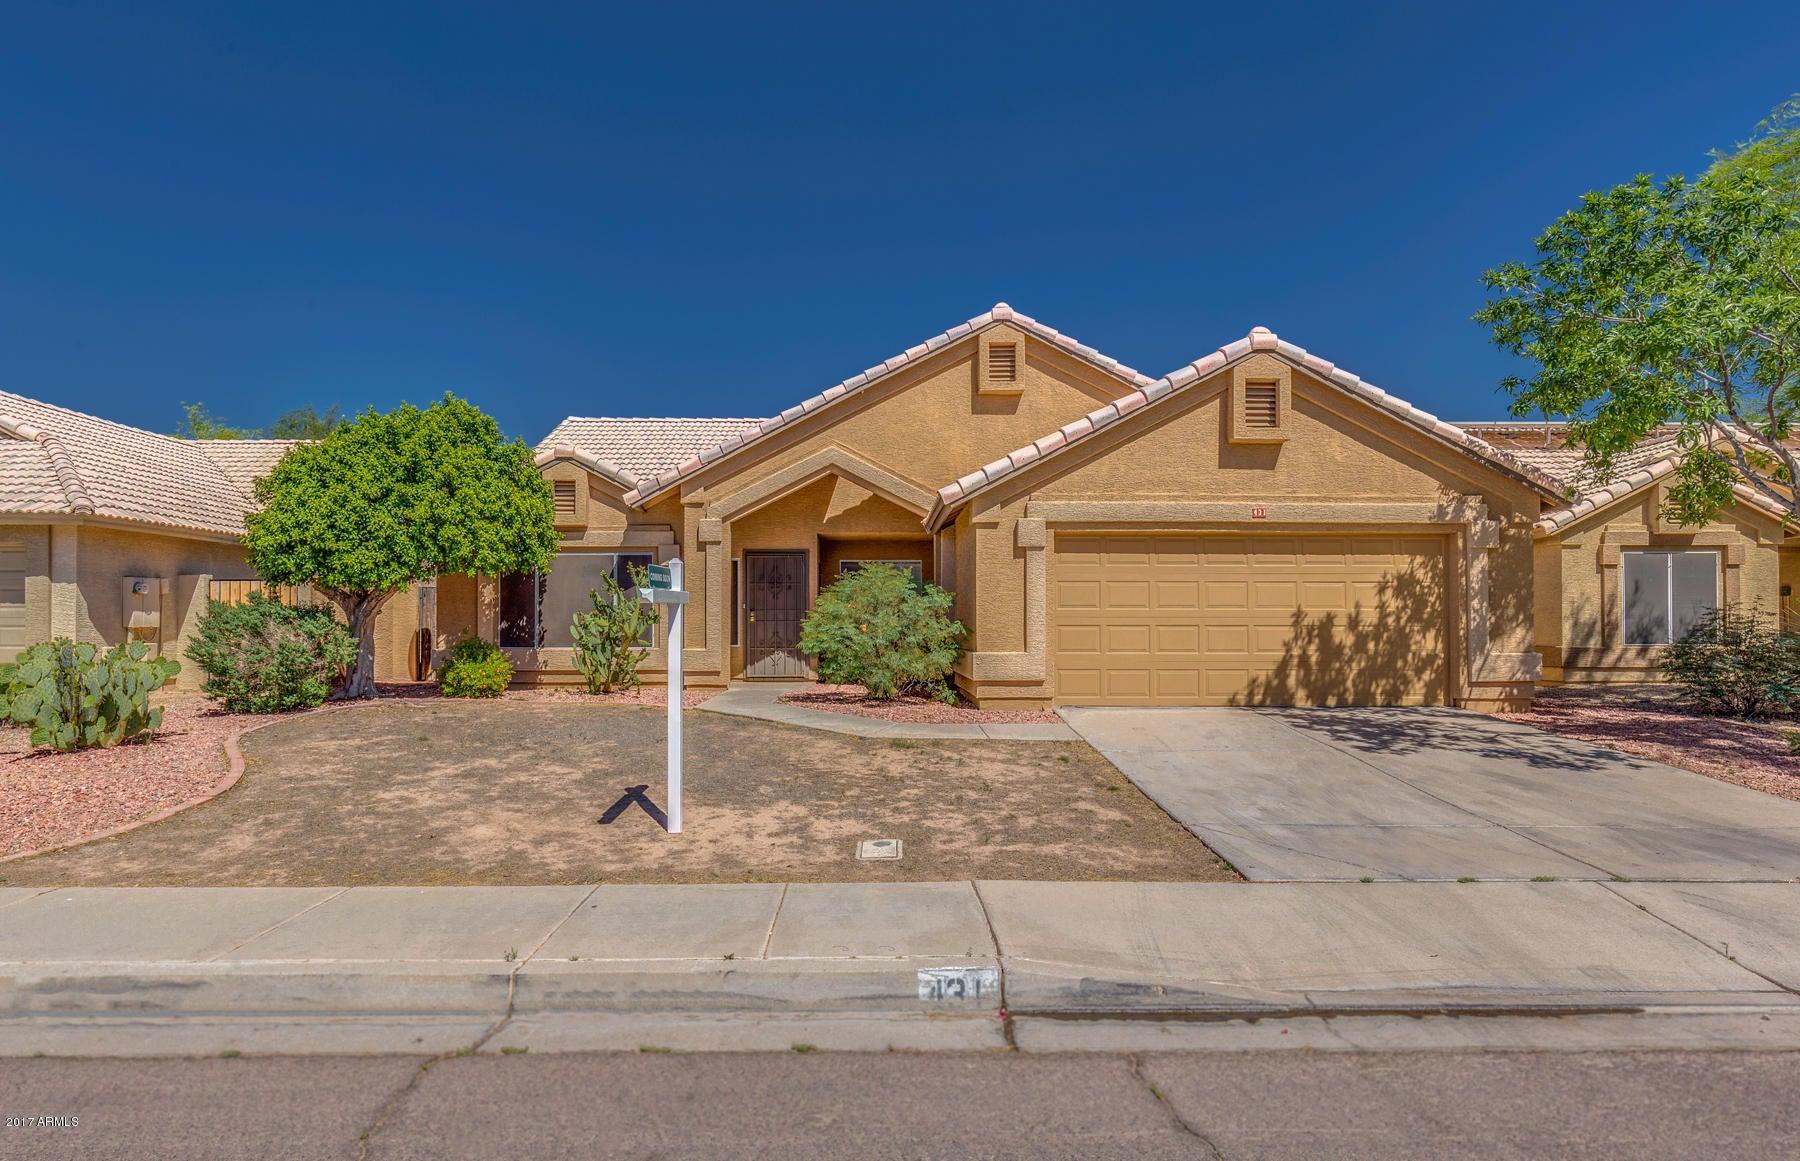 431 N LEOMA Lane, Chandler, AZ 85225